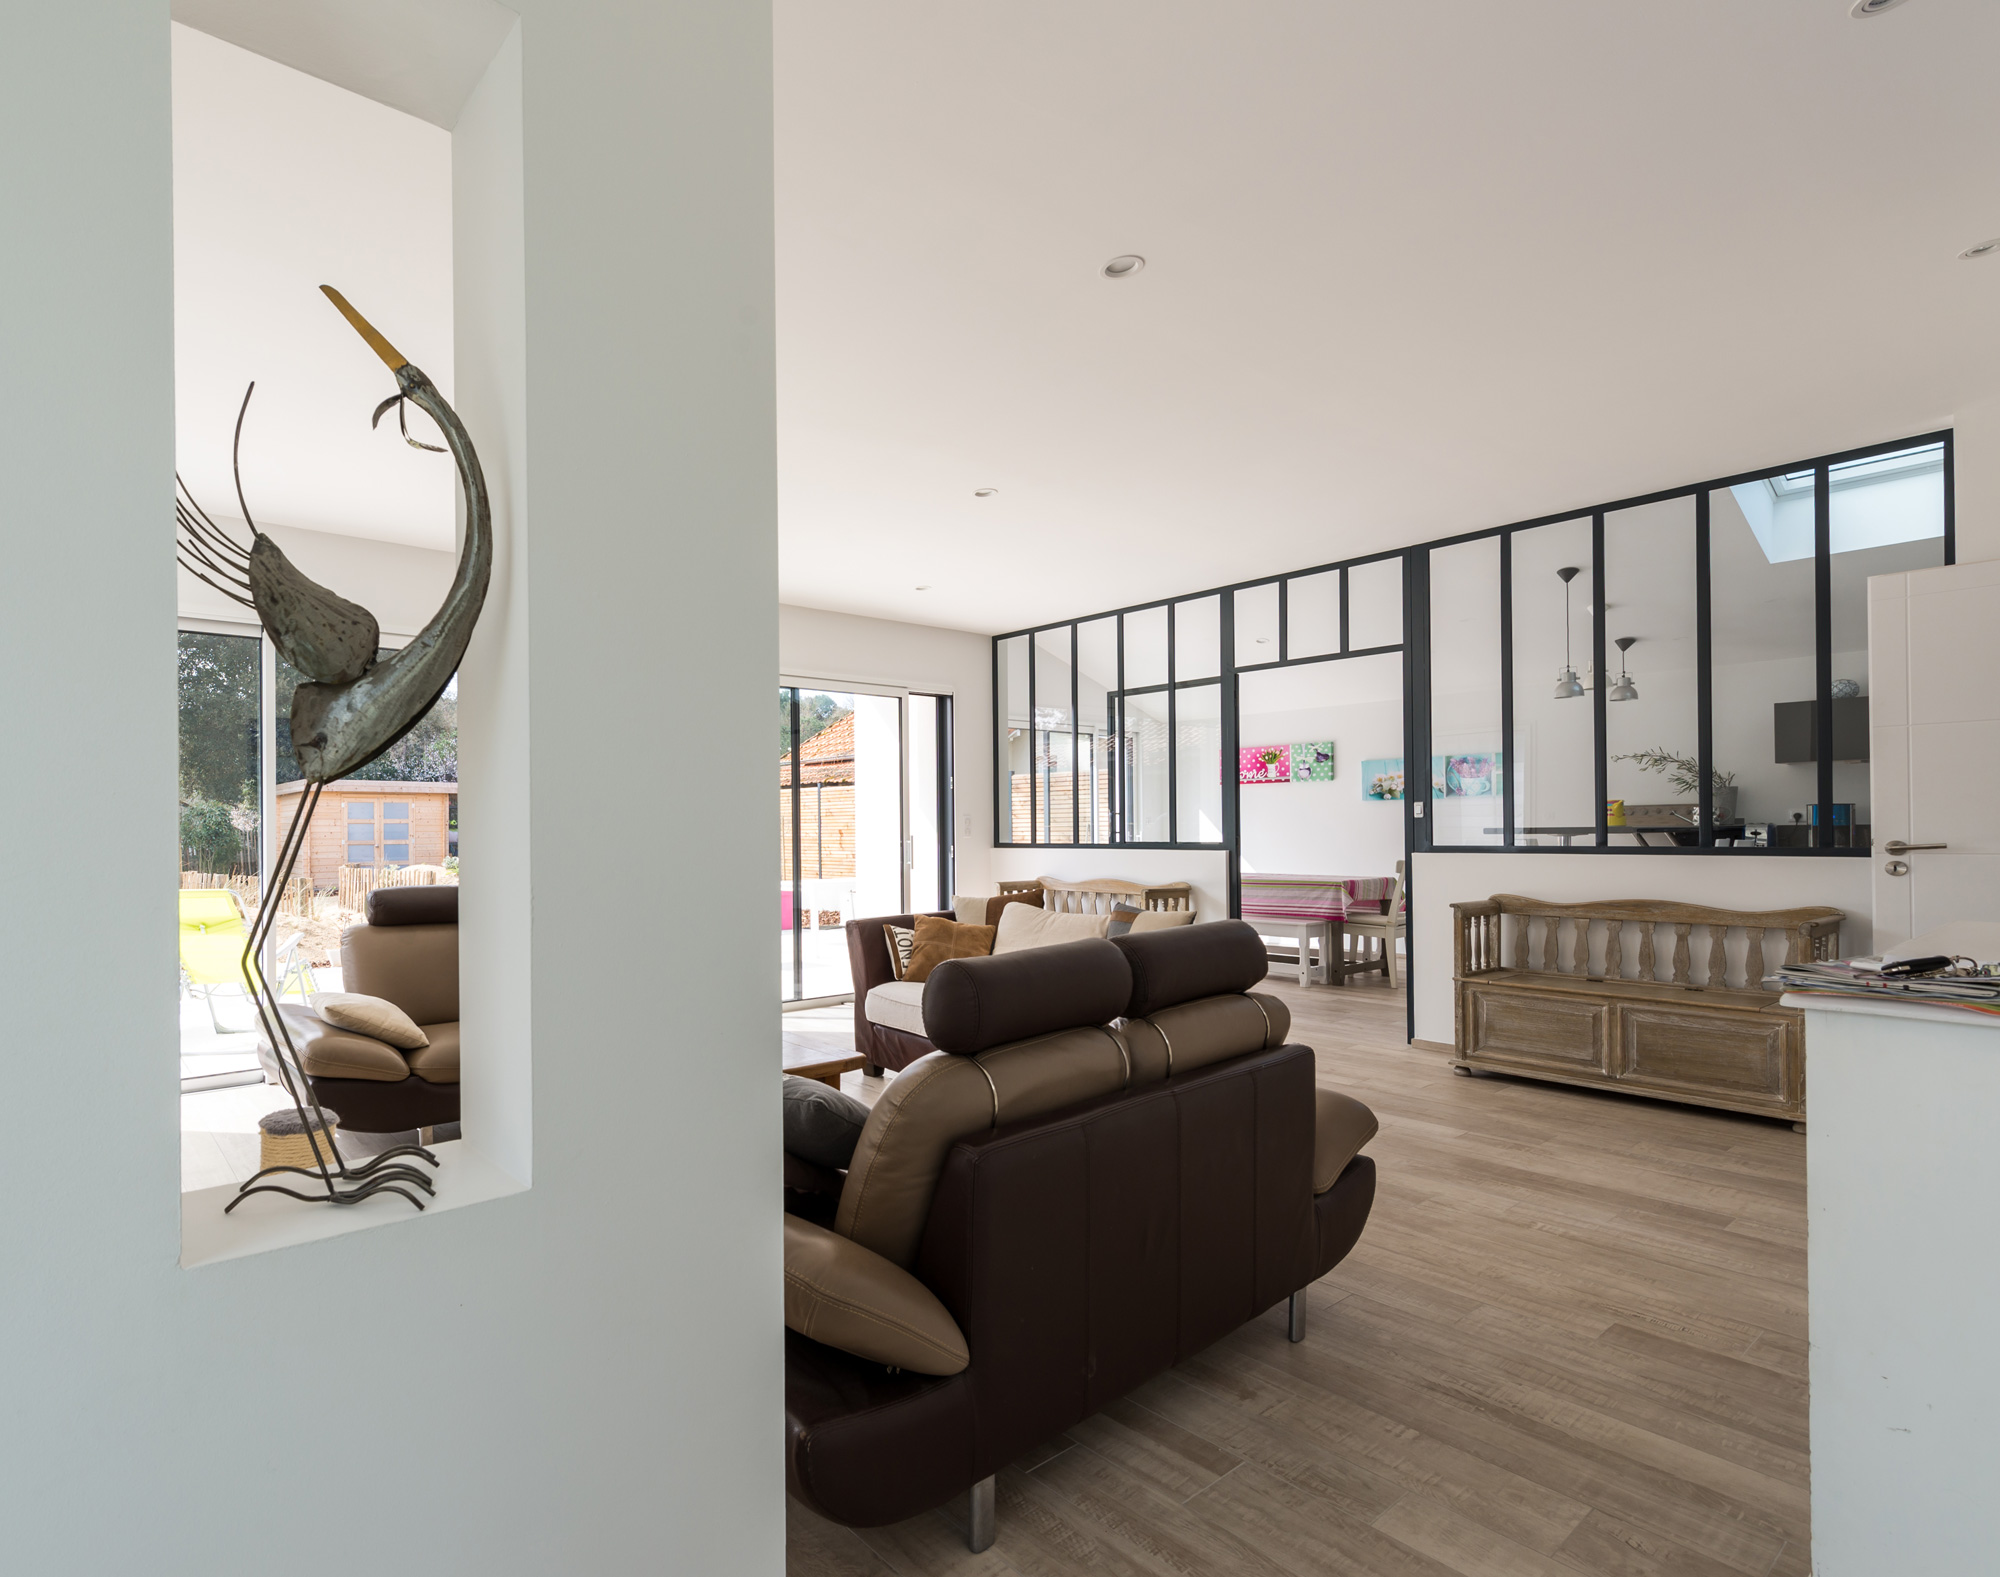 Deco maison neuve salon cuir d angle with deco maison for Decoration interieure maison neuve